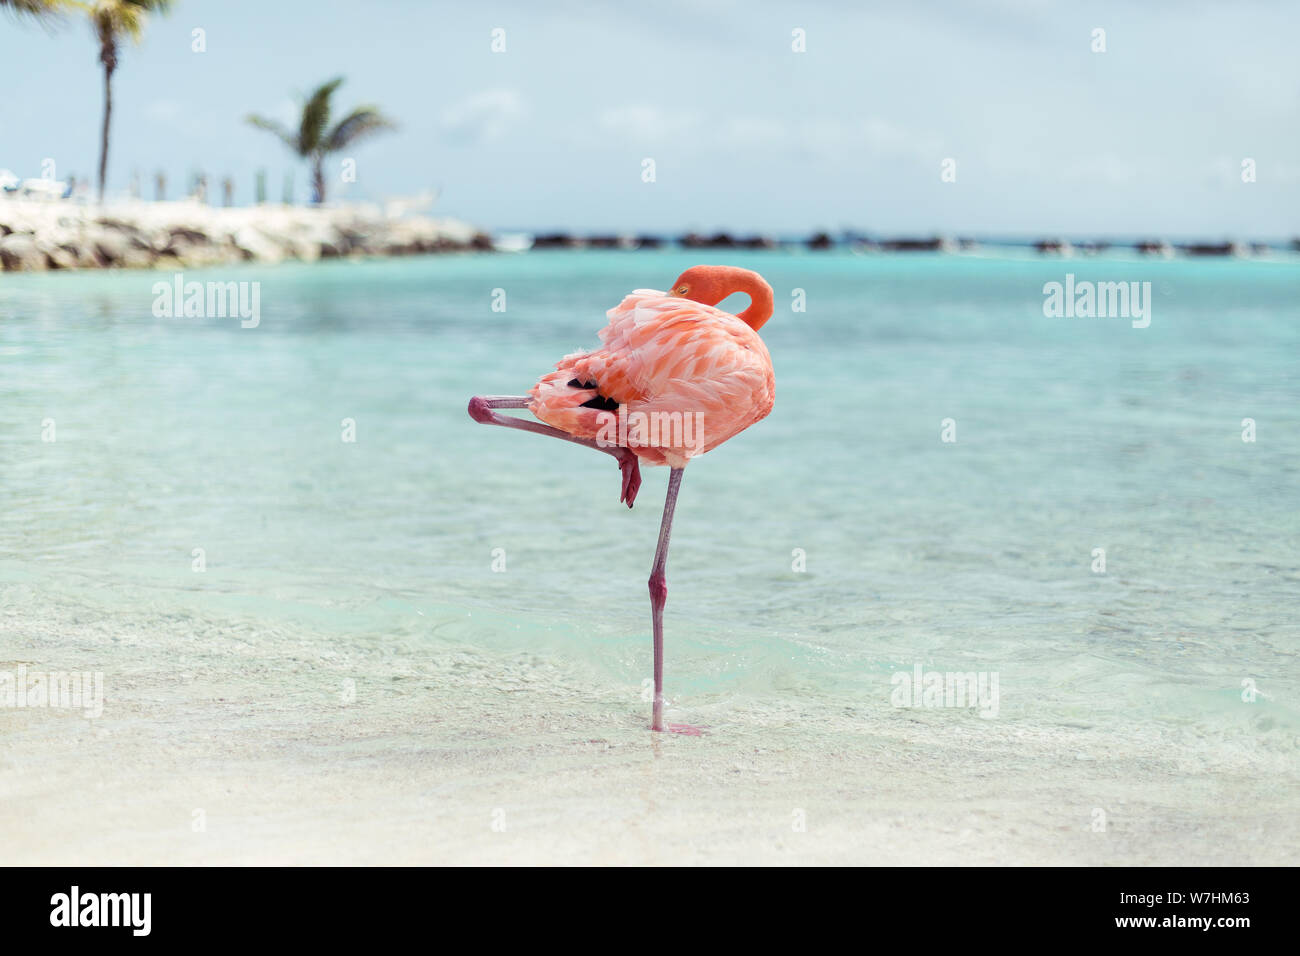 Suis Flamingos auf Flamingo Beach, Aruba niederländische Antillen, Flamingo am Strand Banque D'Images